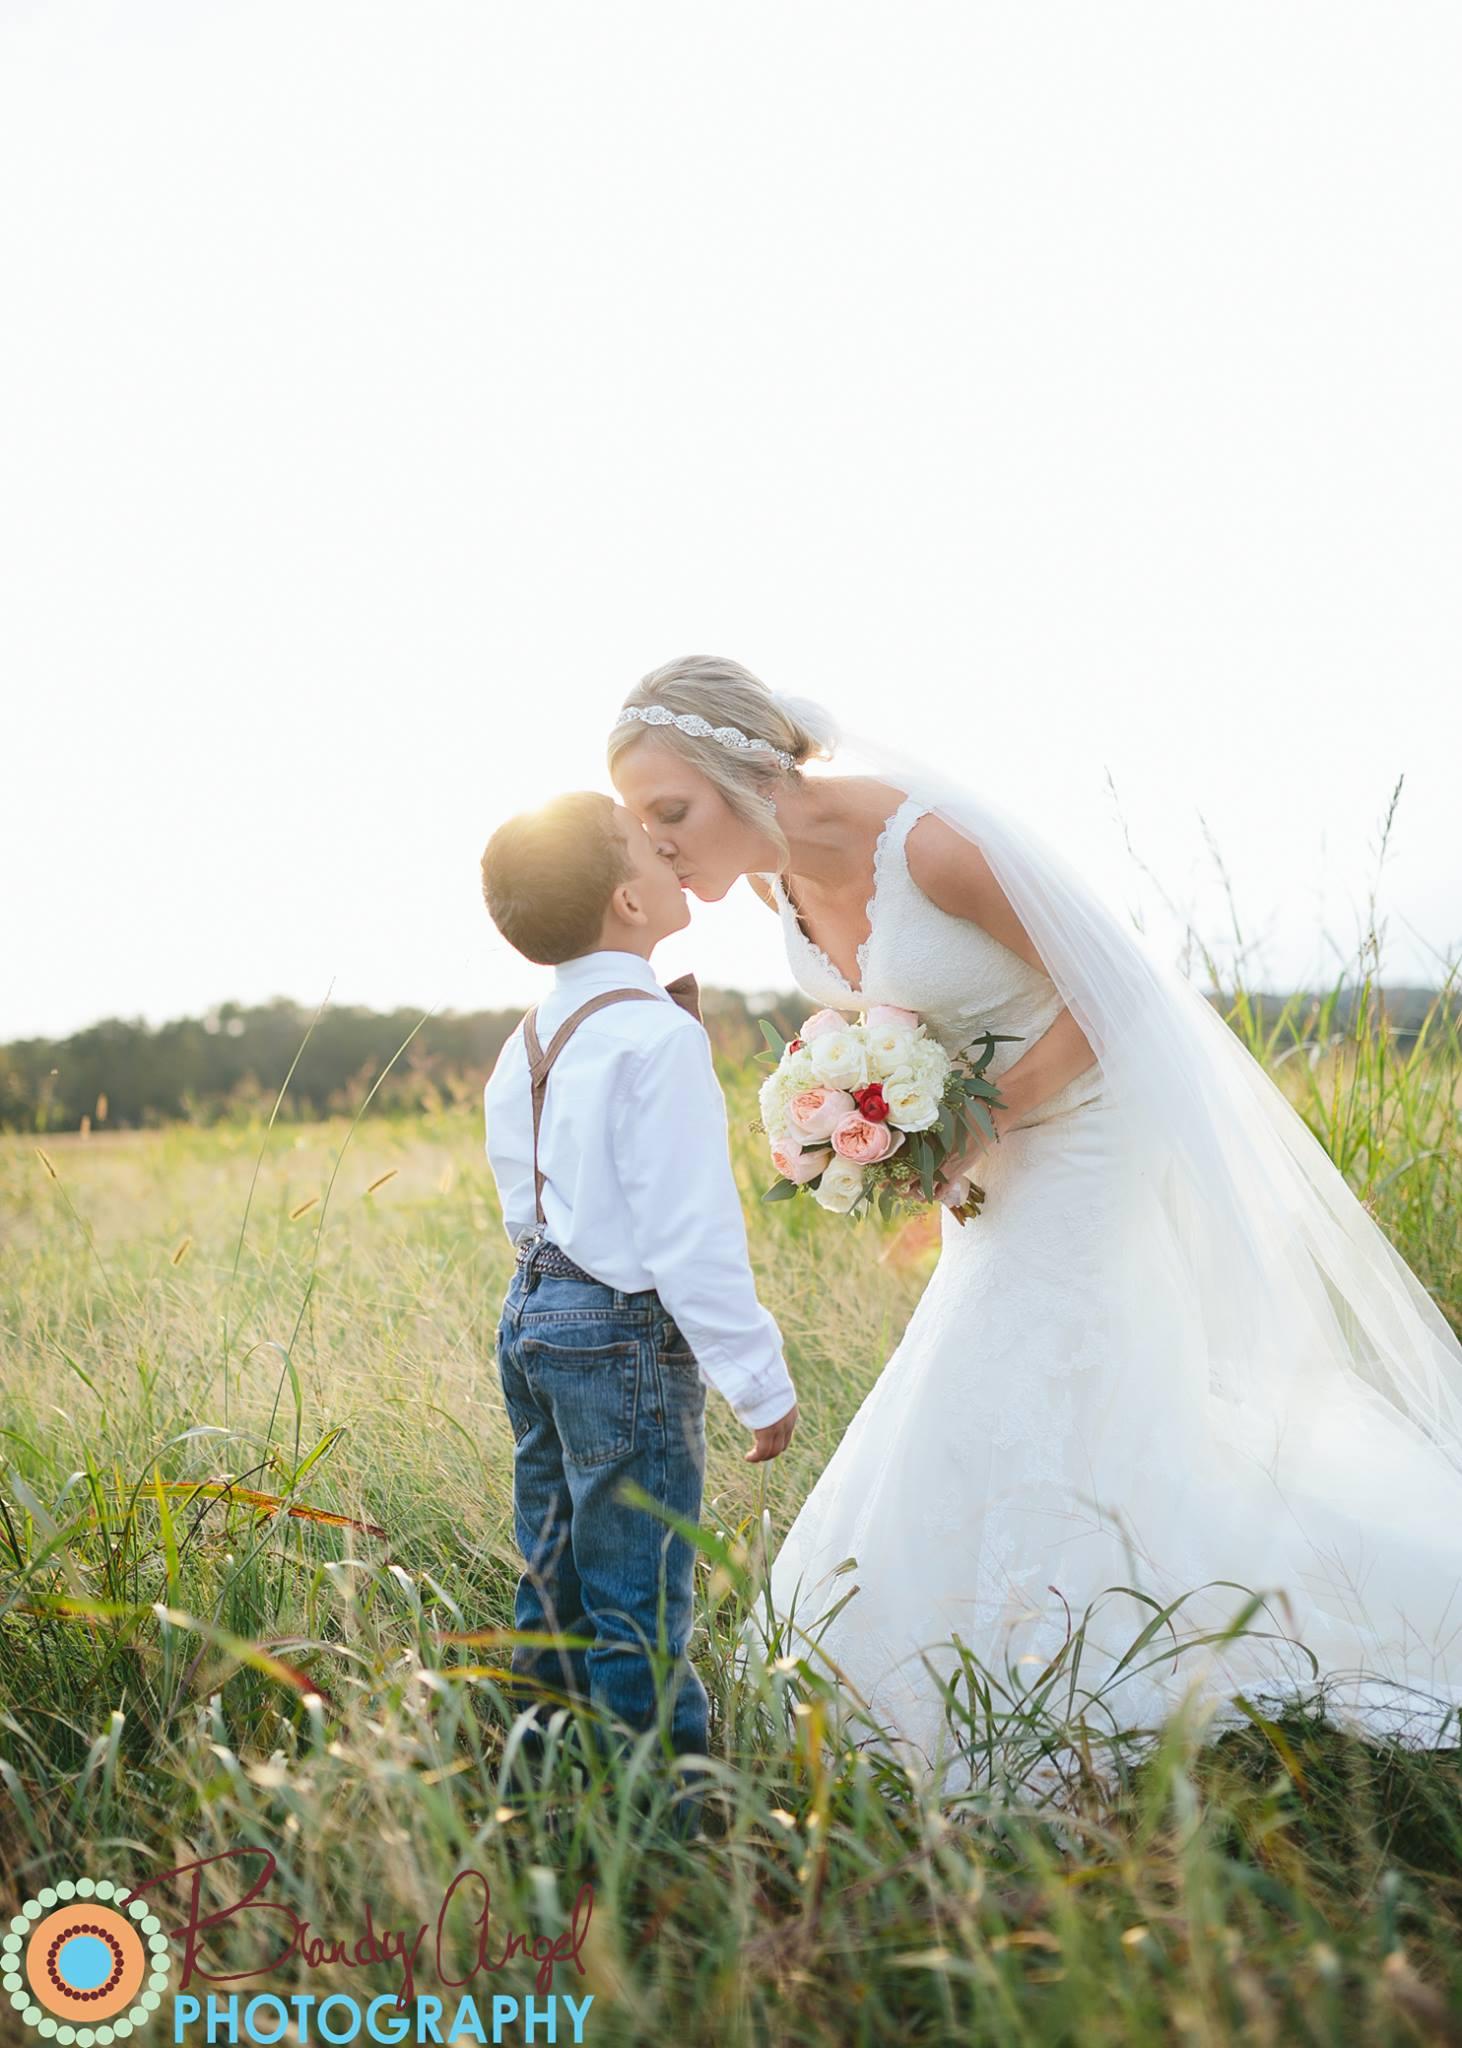 Thompson-wedding-mother-son